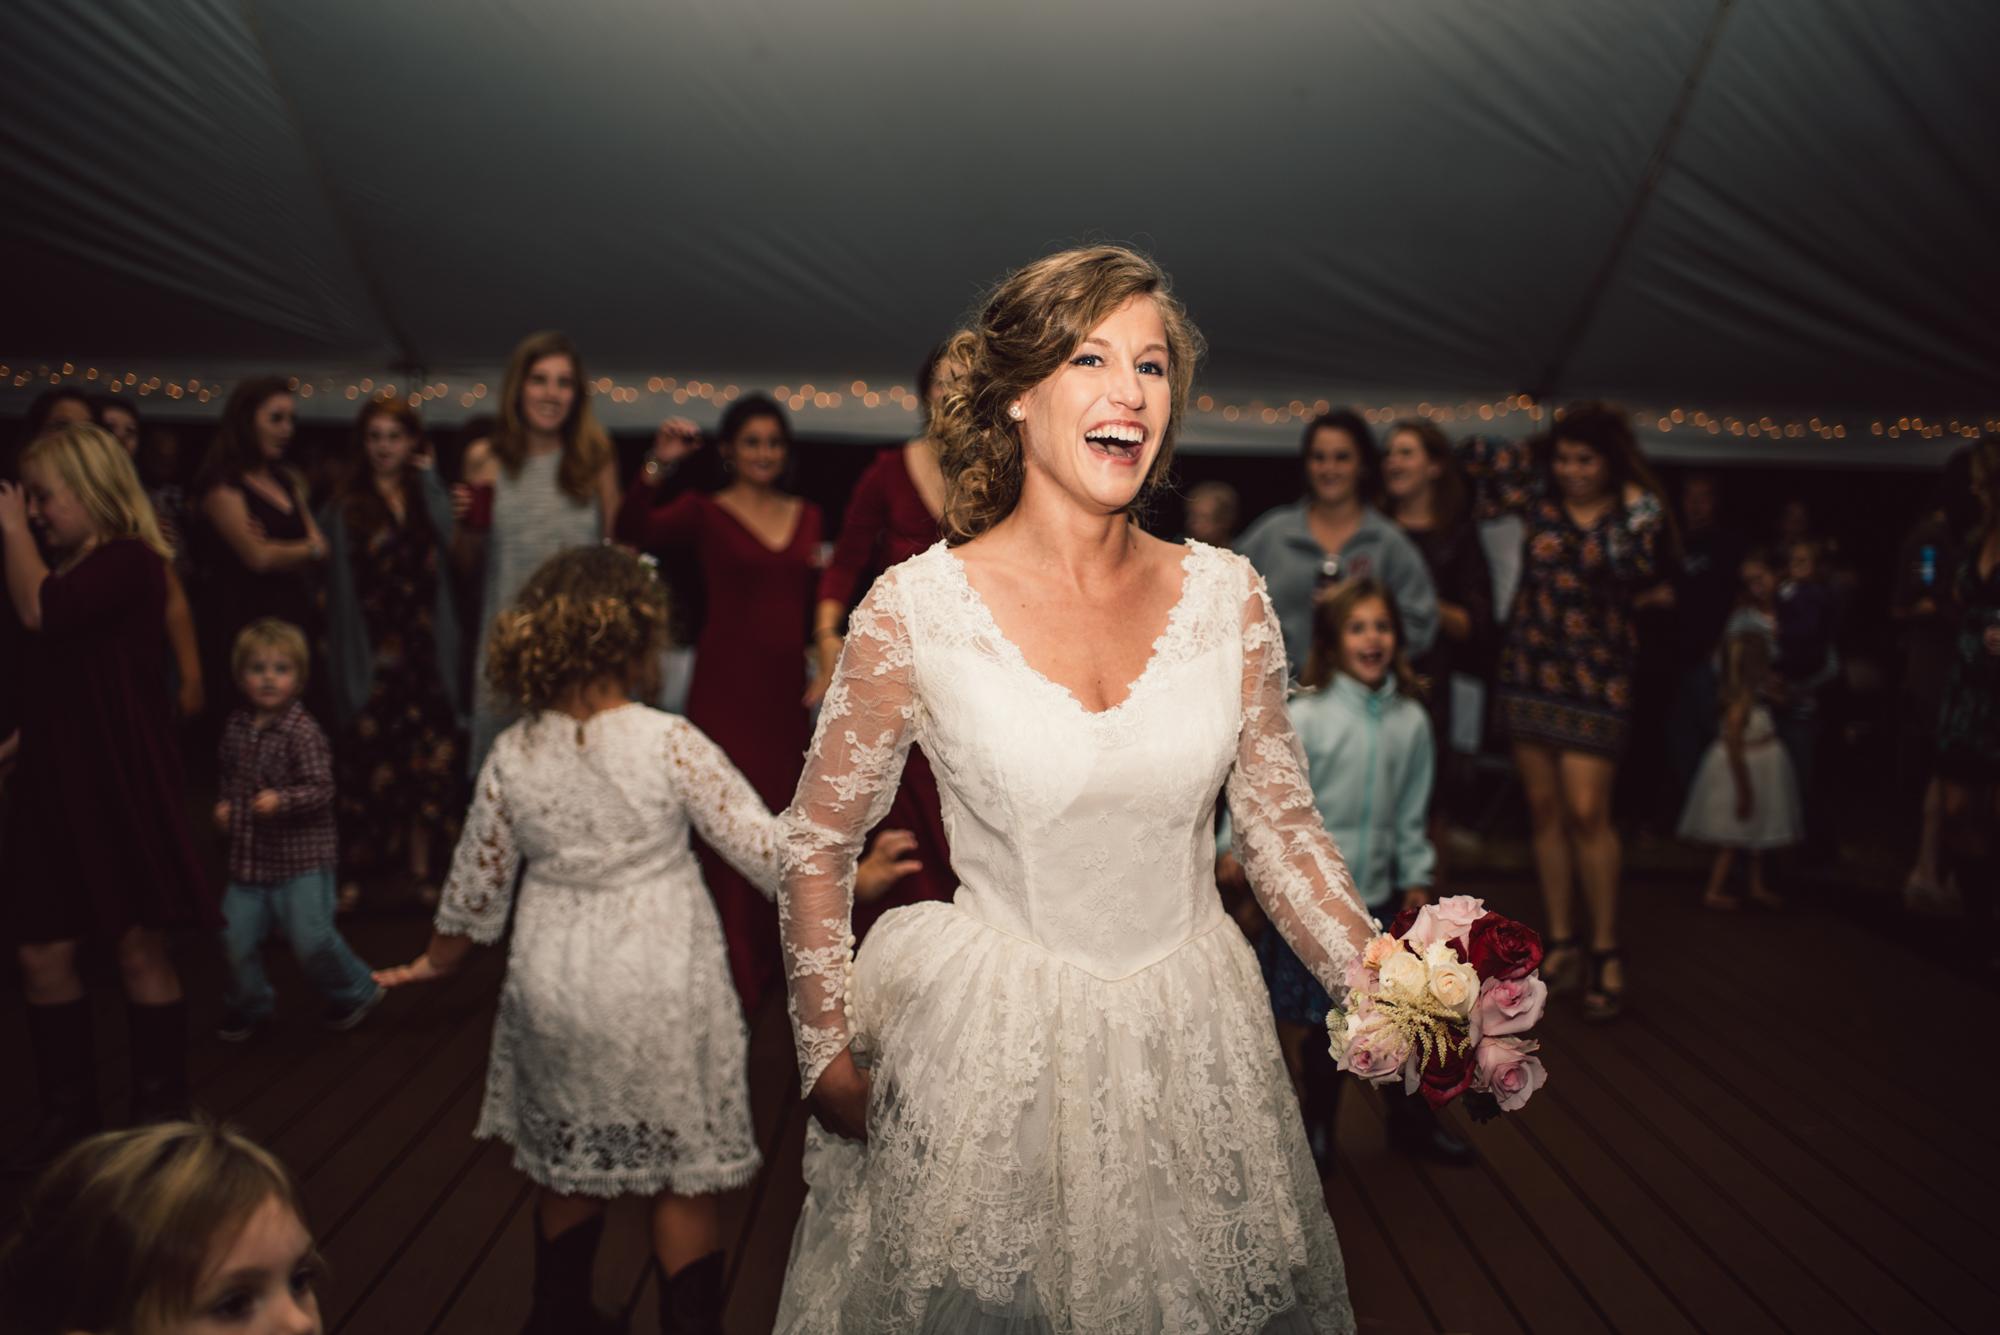 Ashley-and-Michael-Beaune-Woodstock-Virginia-Wedding-Shenandoah-Valley_58.JPG